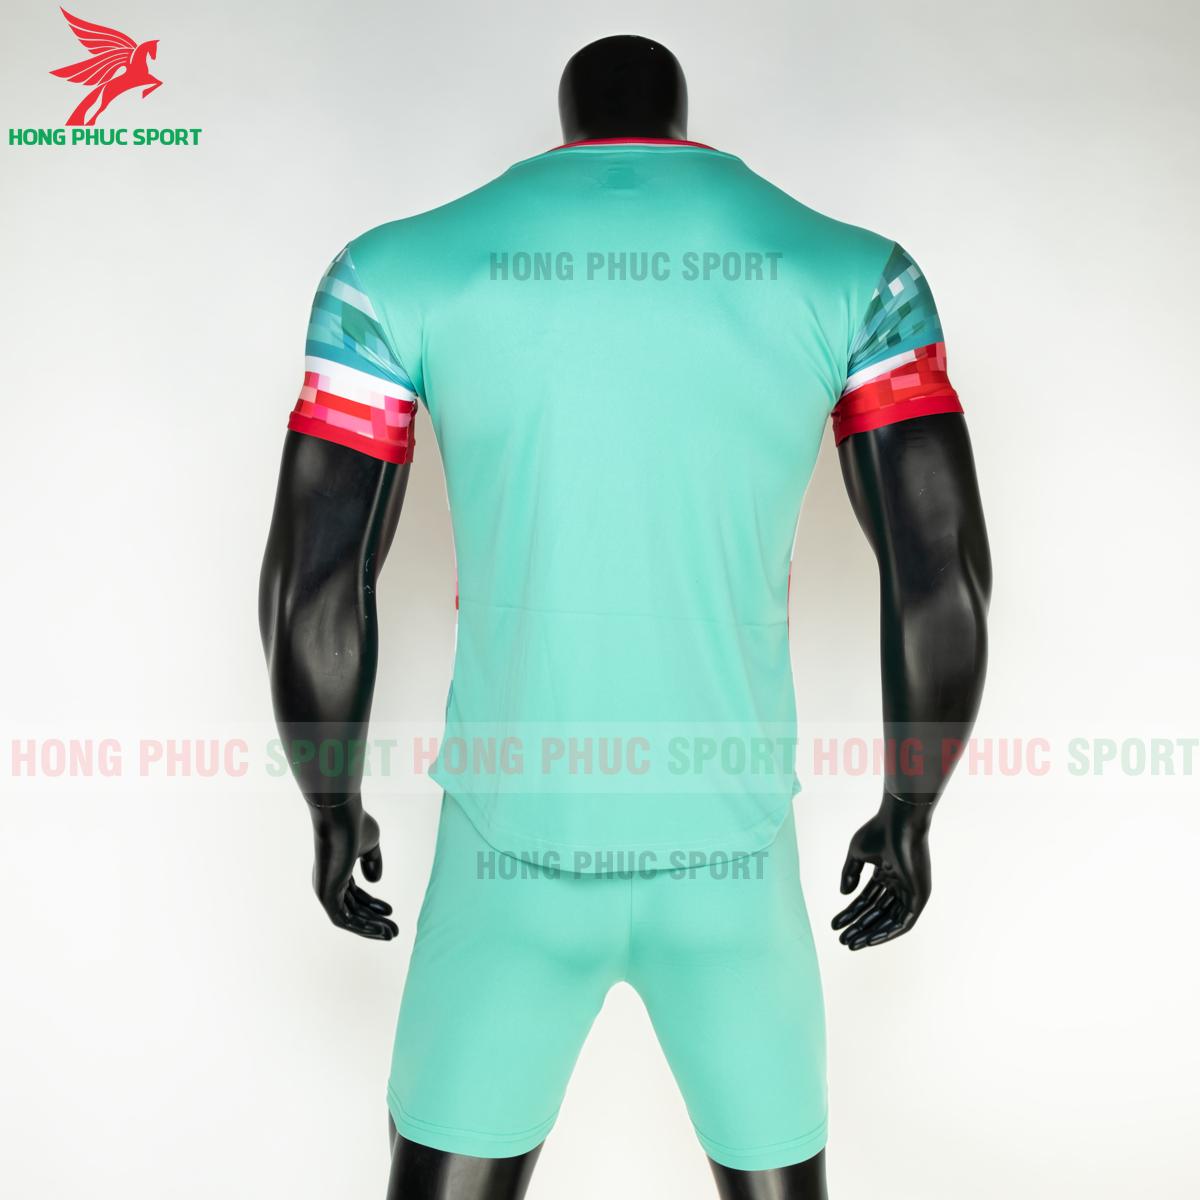 https://cdn.hongphucsport.com/unsafe/s4.shopbay.vn/files/285/ao-da-bong-liverpool-2020-2021-phien-ban-fan-8-5fe1ad1ab6598.png